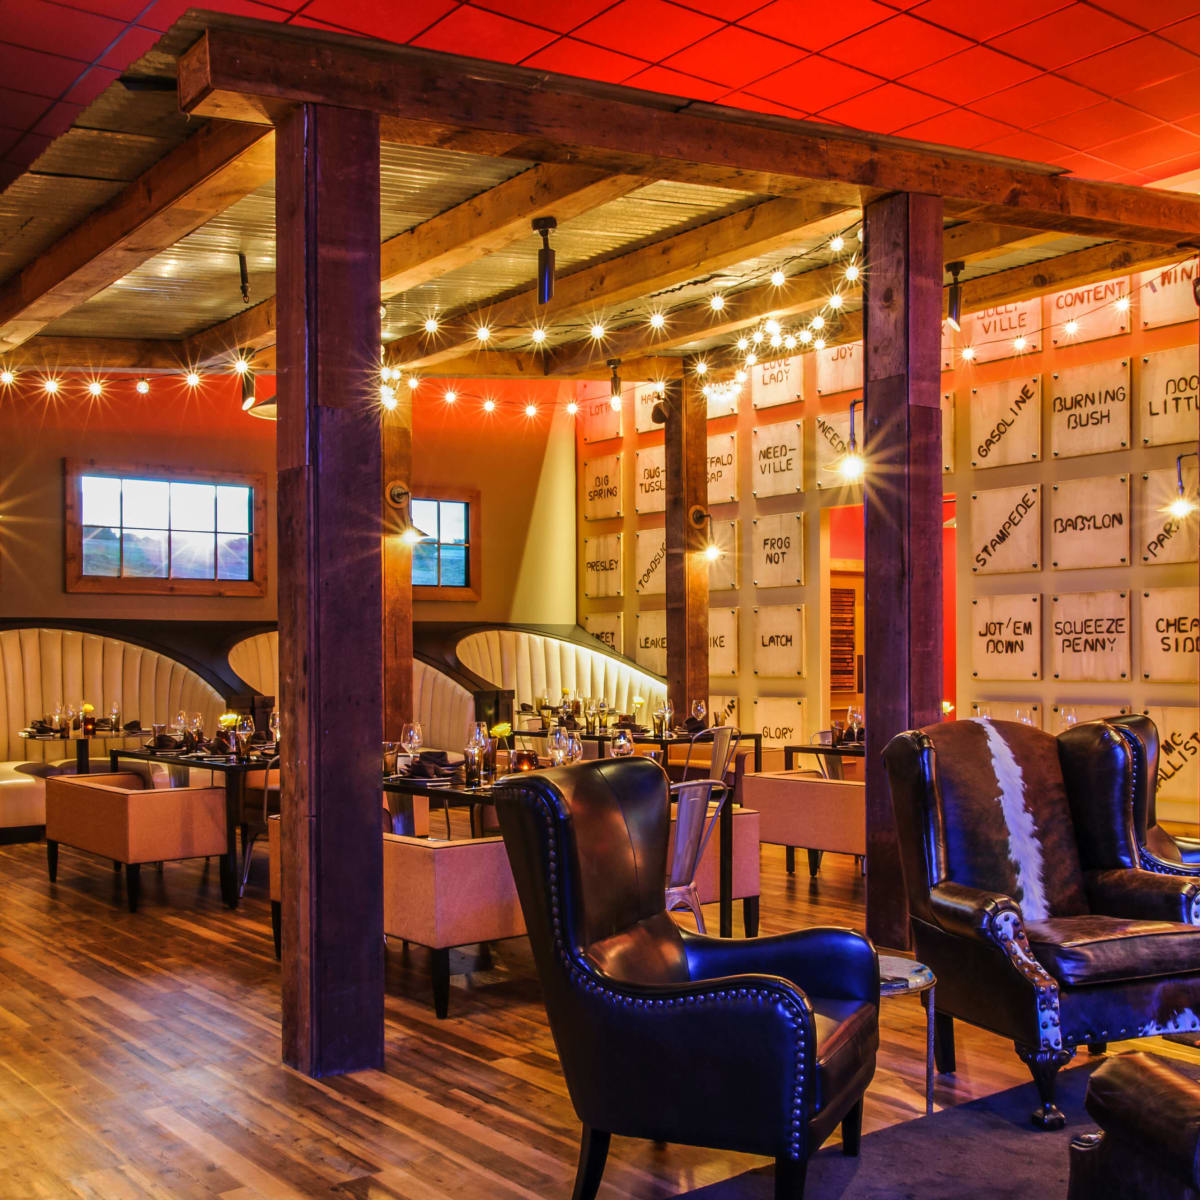 Interior of Stampede 66 restaurant in Dallas